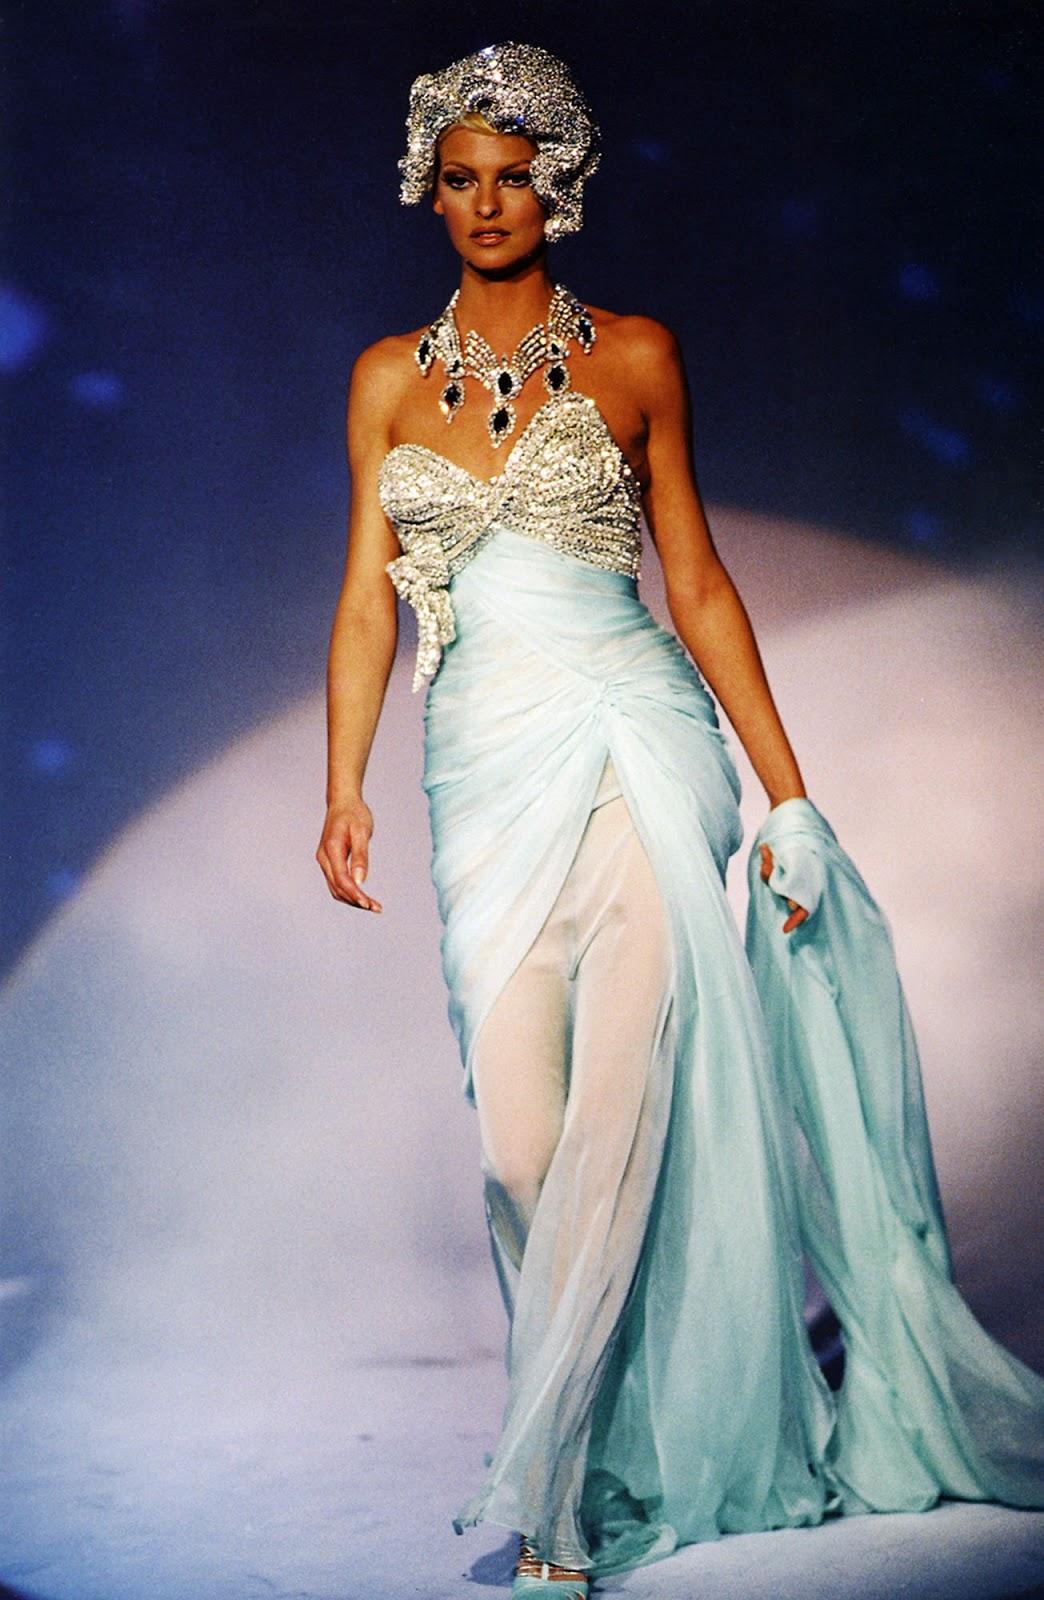 Eniwhere Fashion - Top Models 90's - Linda Evangelista